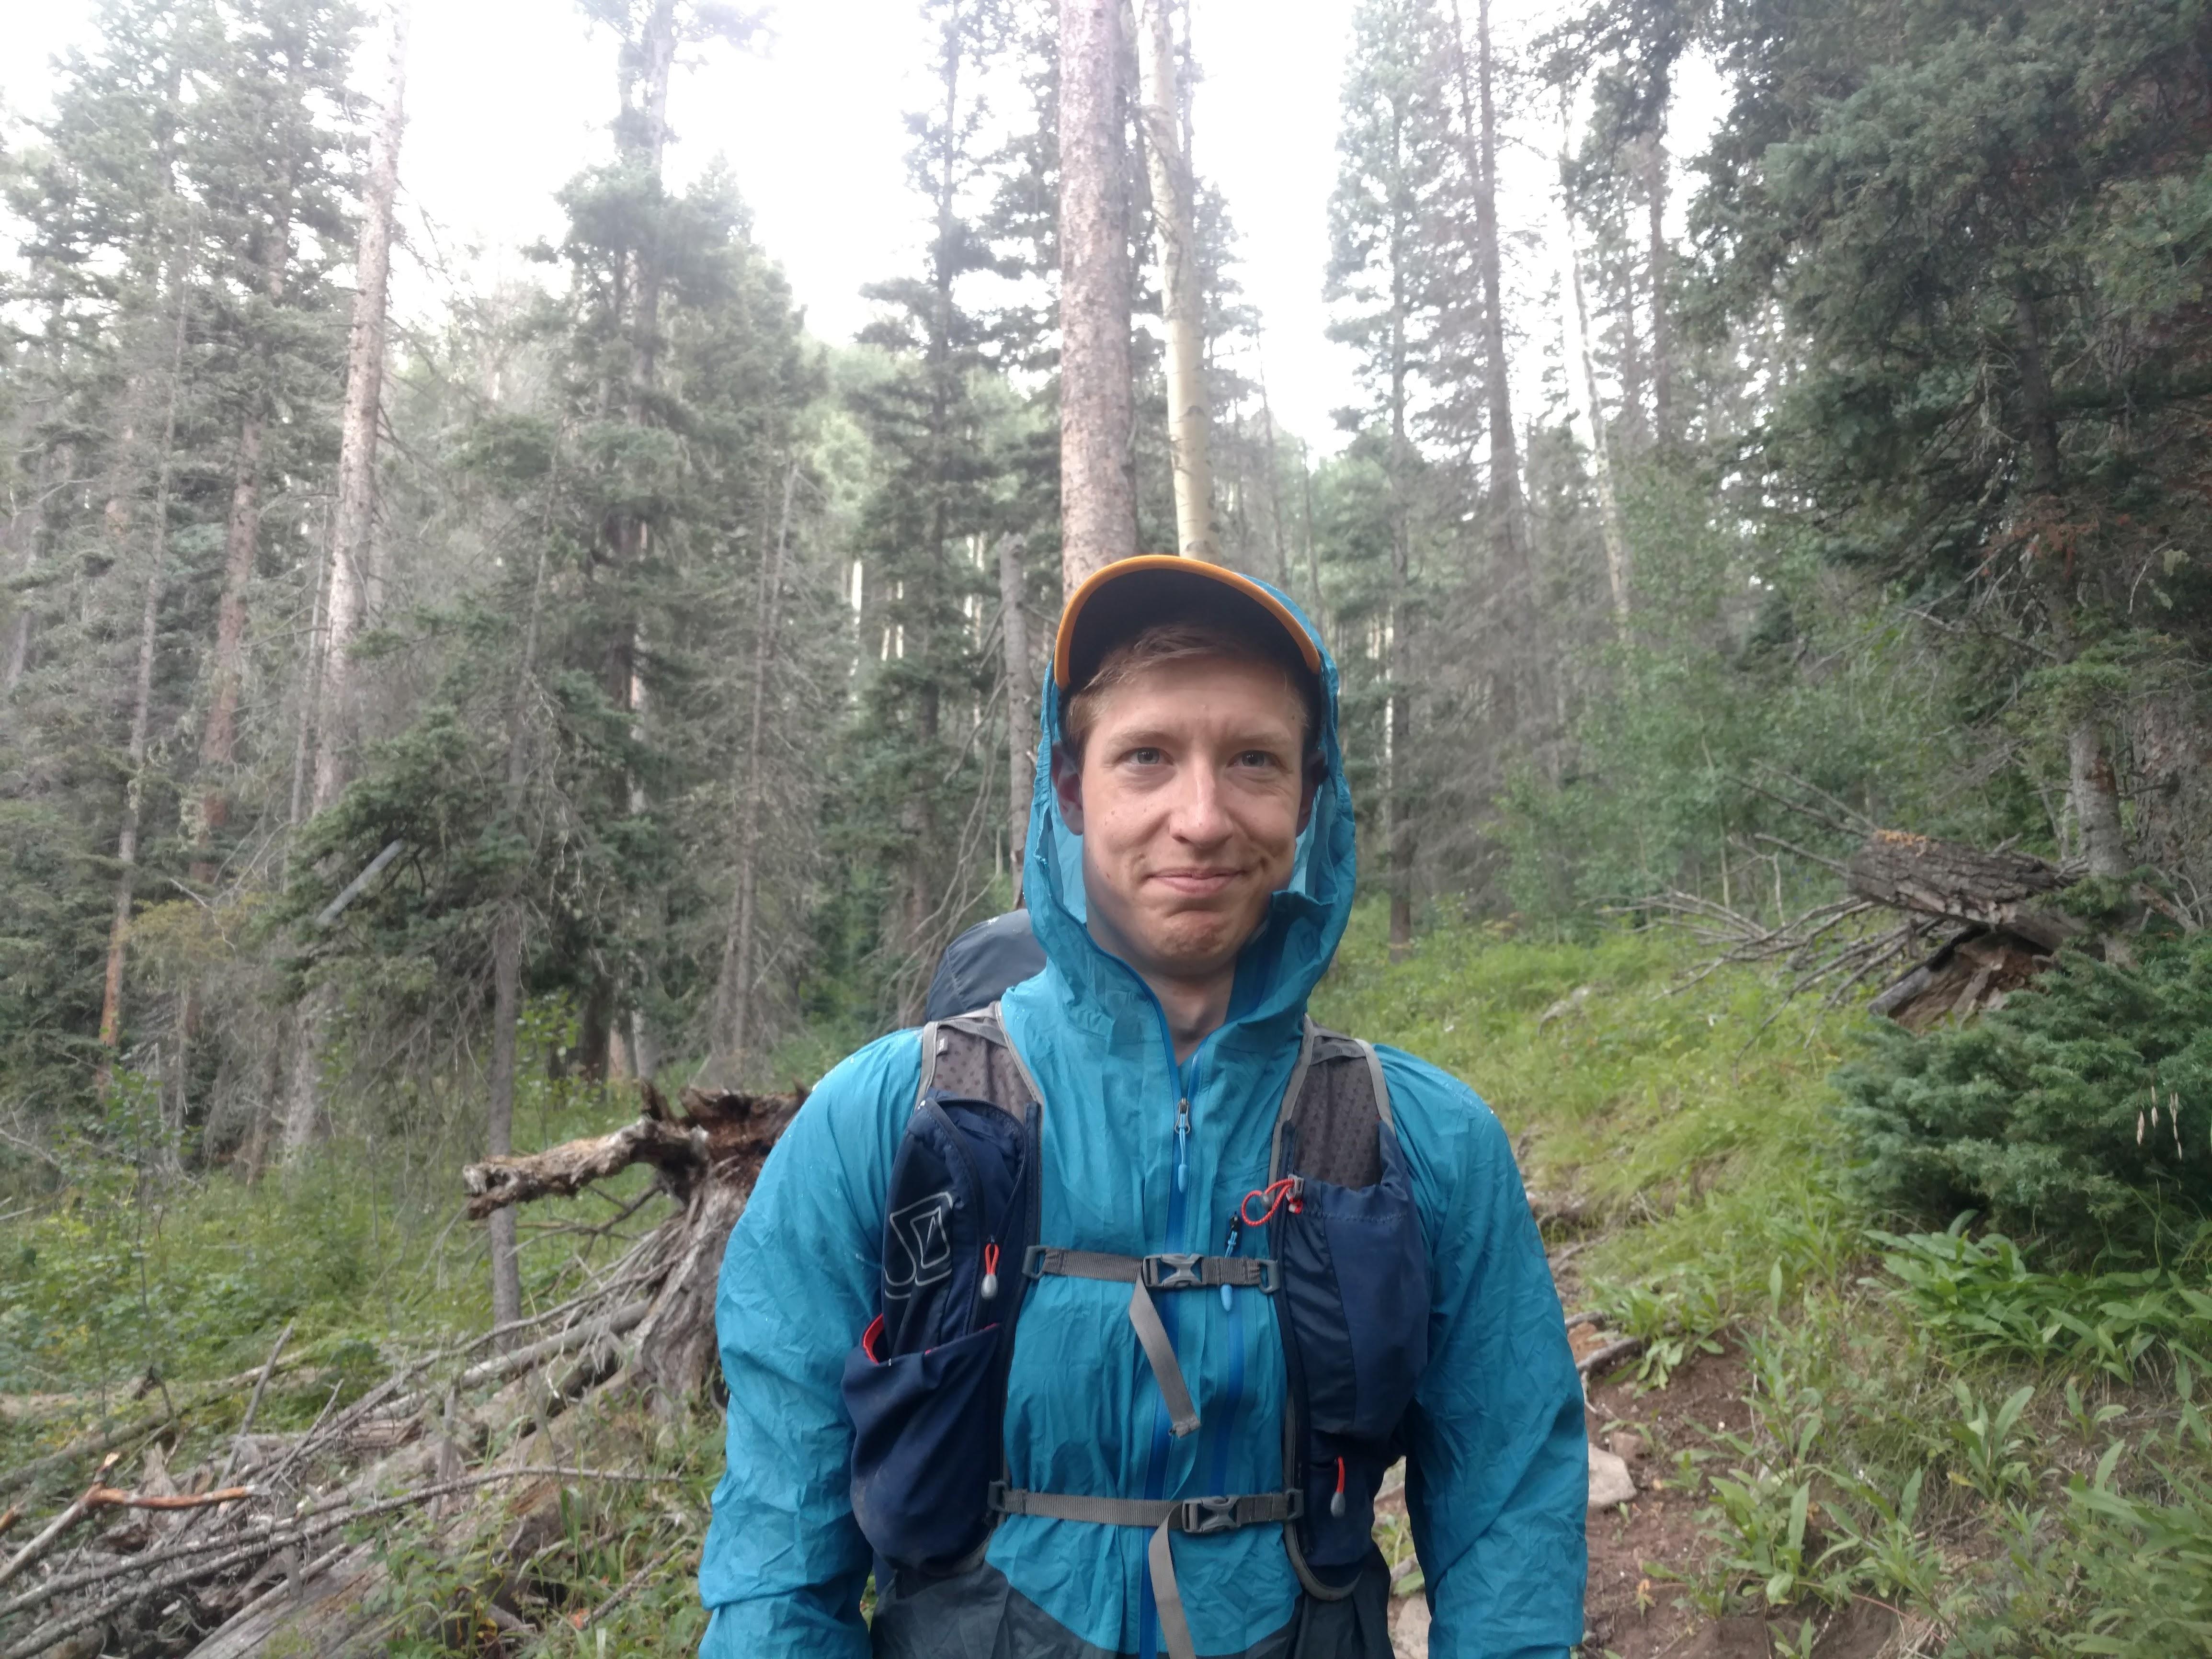 hiking-in-the-rain